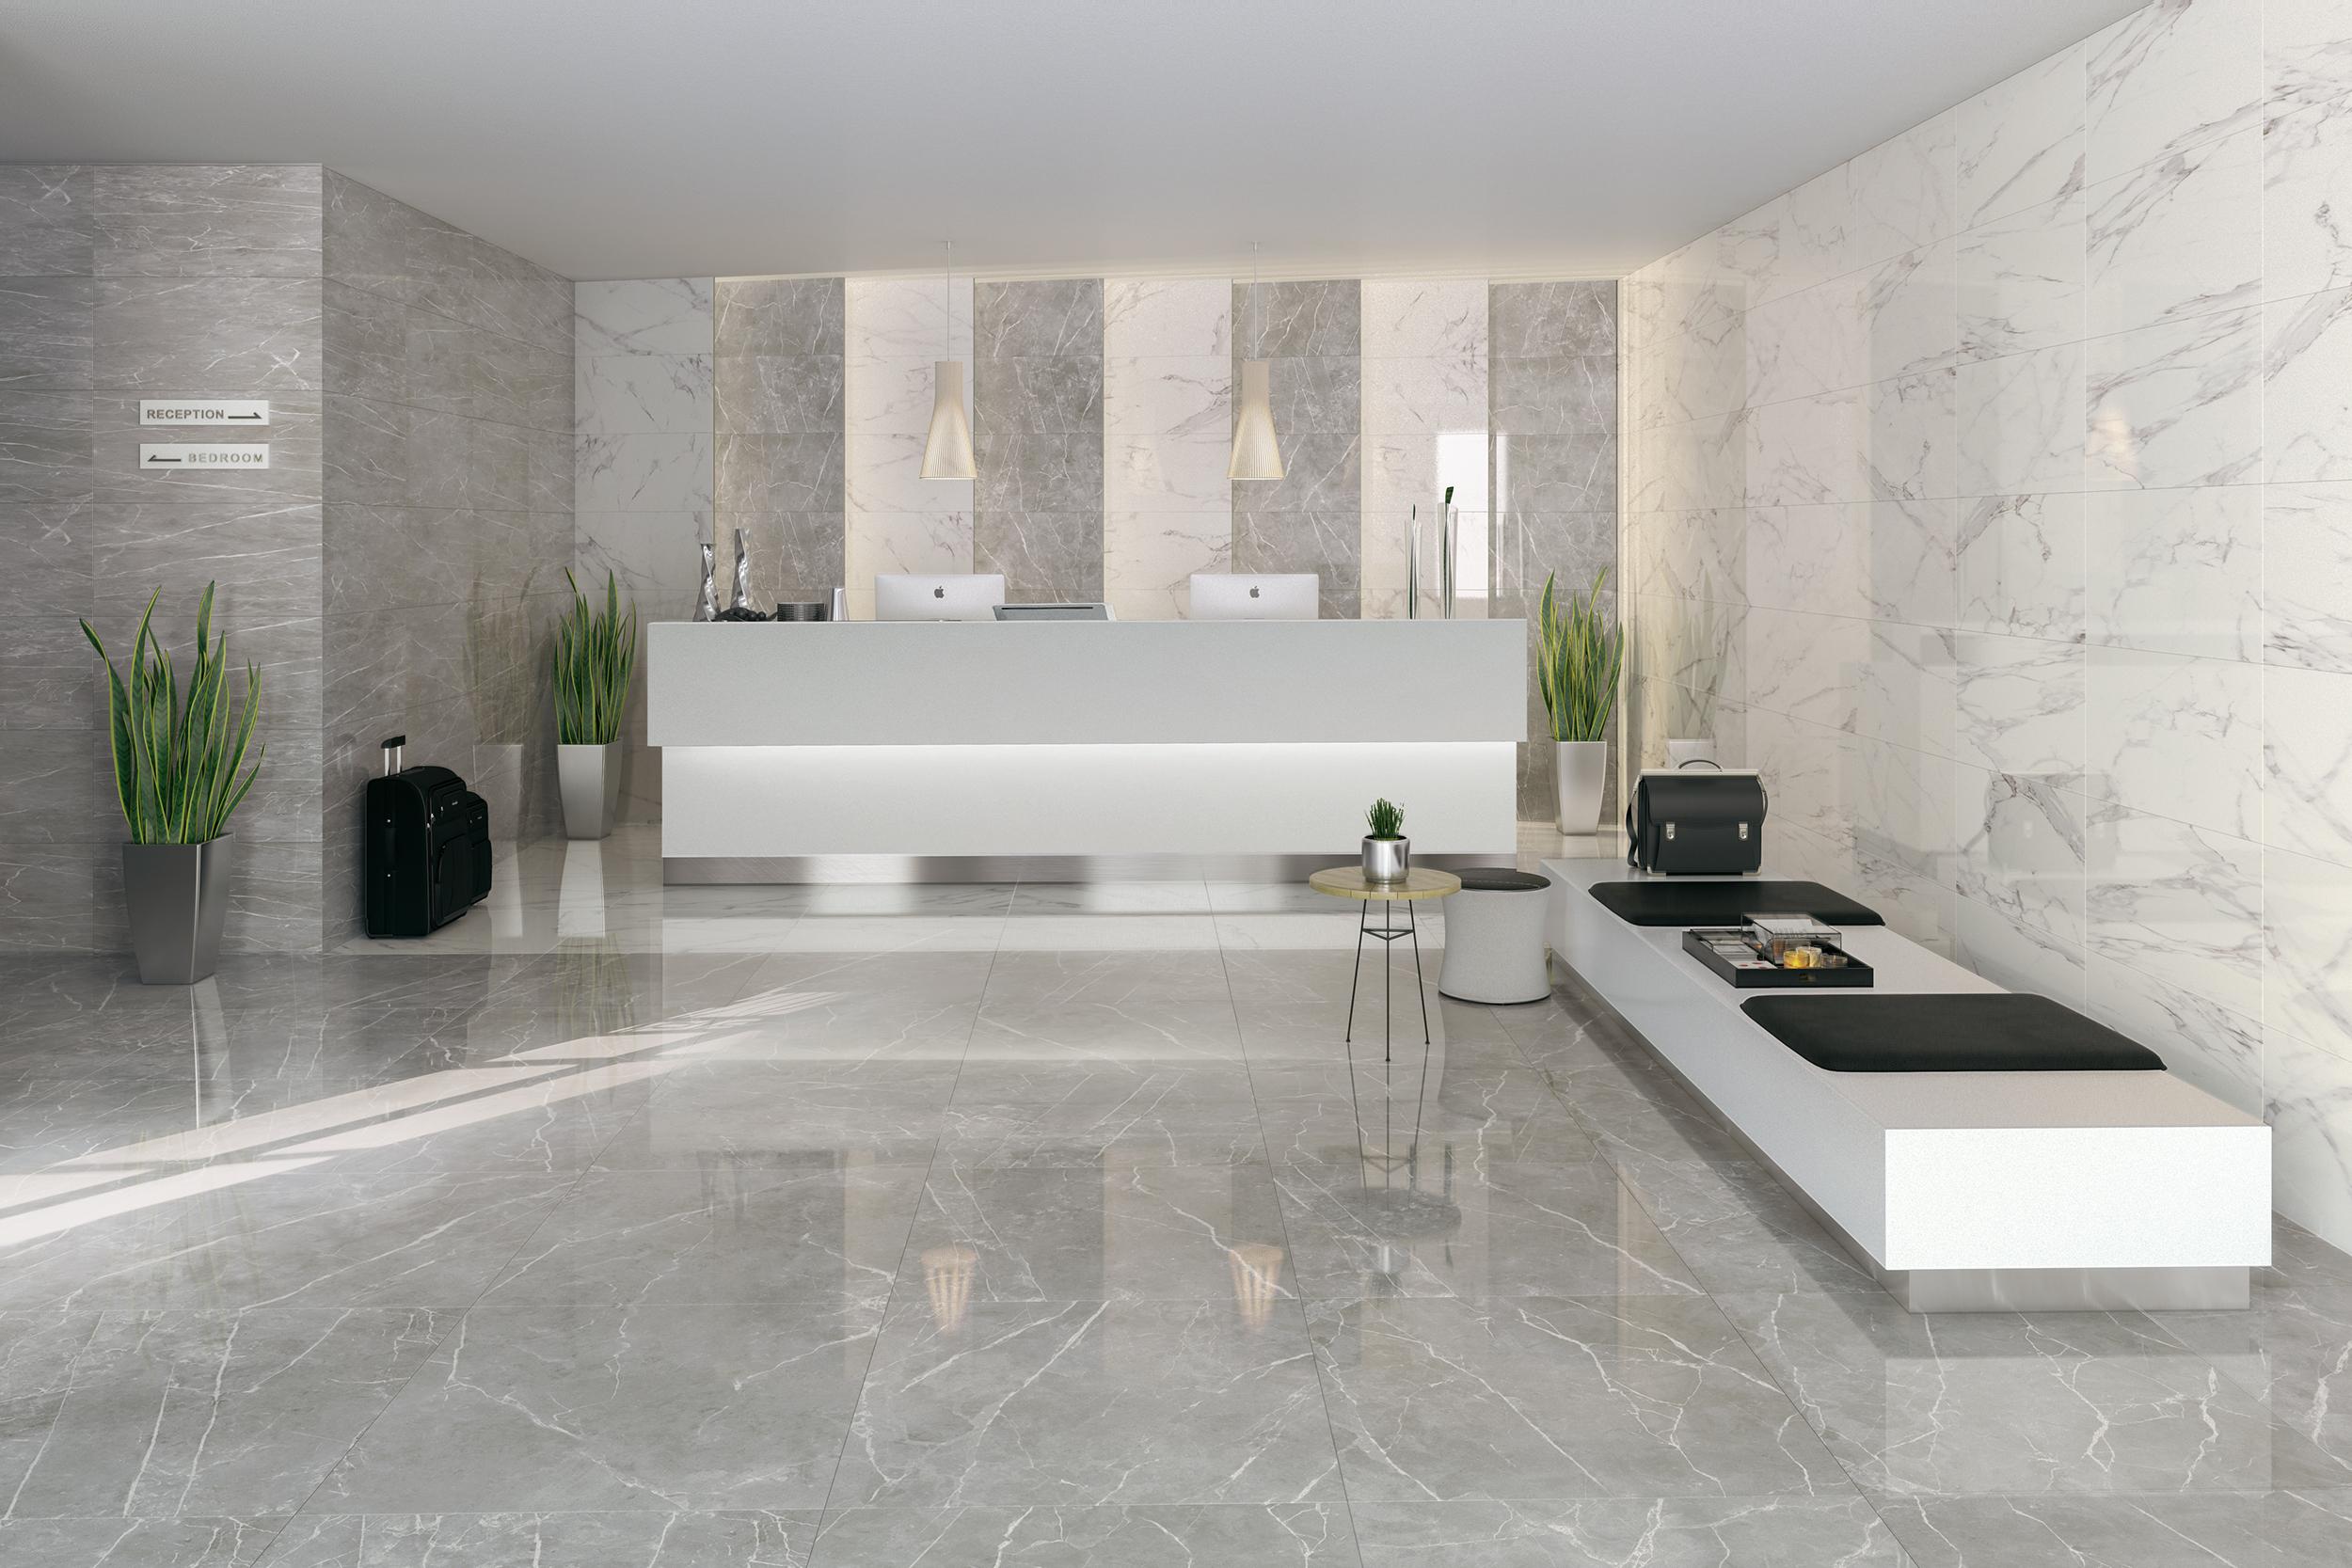 Stunning Bagni Moderni In Marmo Photos - New Home Design 2018 - ummoa.us